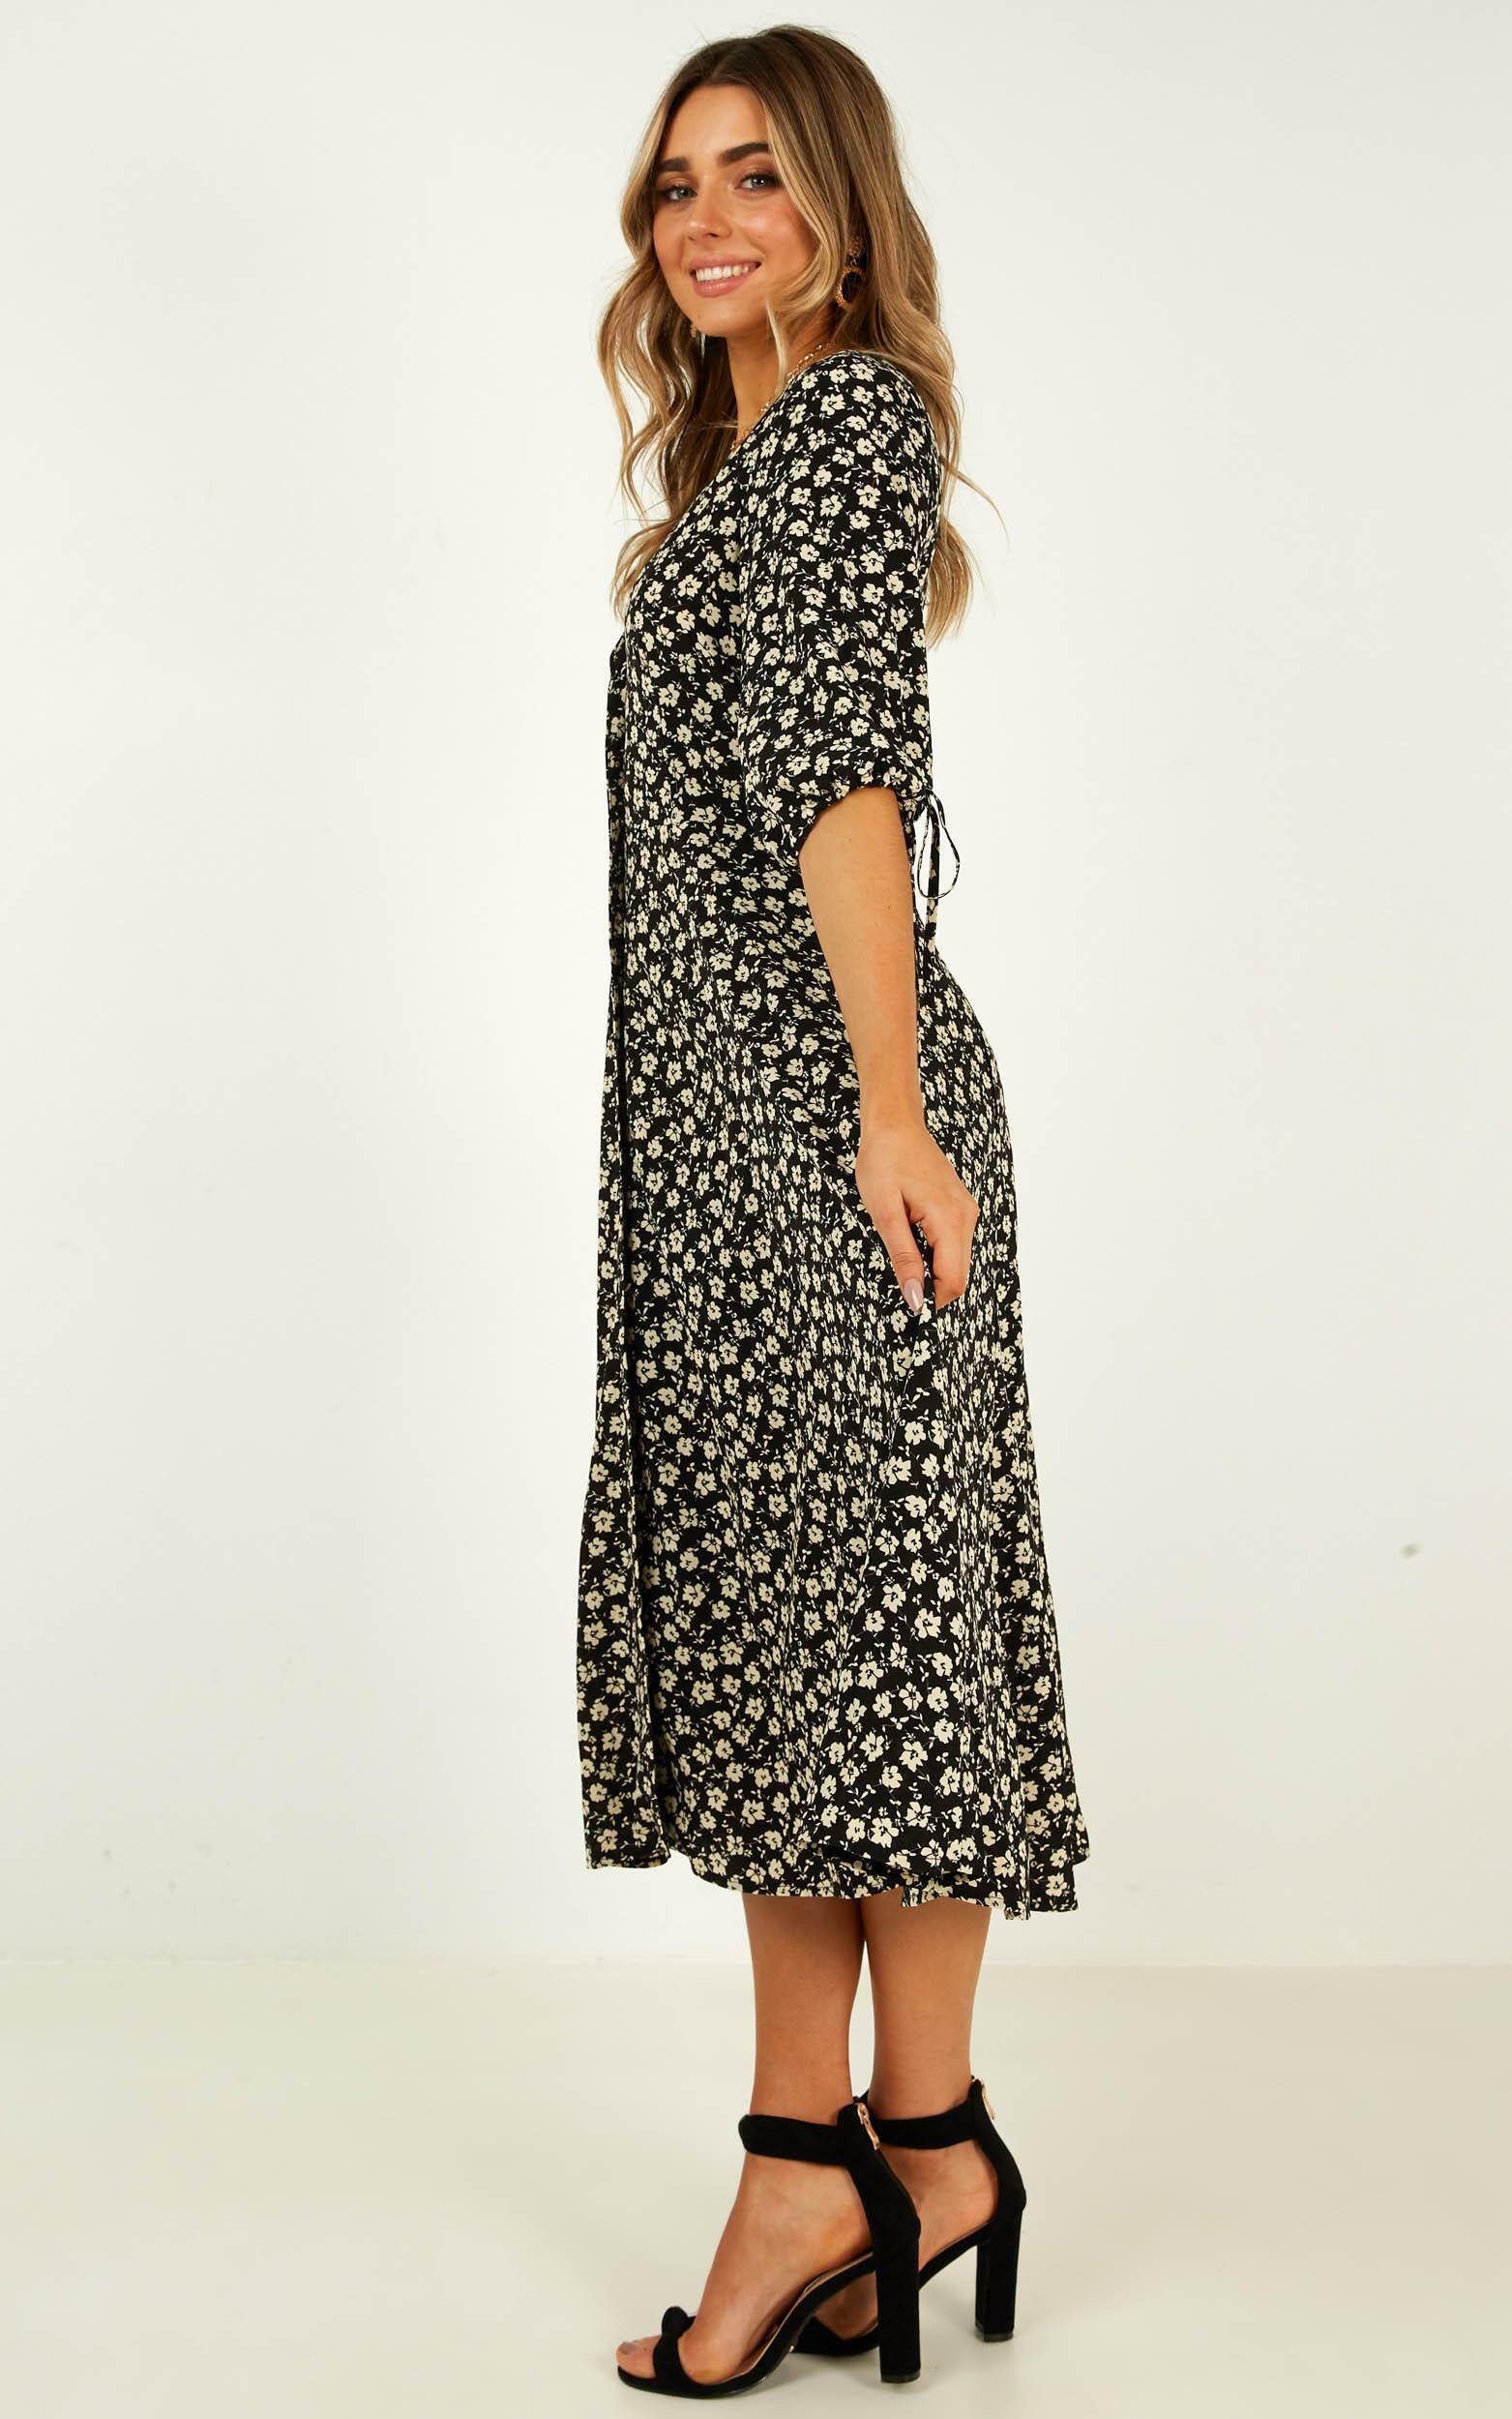 Tonal Feel Dress in black floral - 20 (XXXXL), Black, hi-res image number null